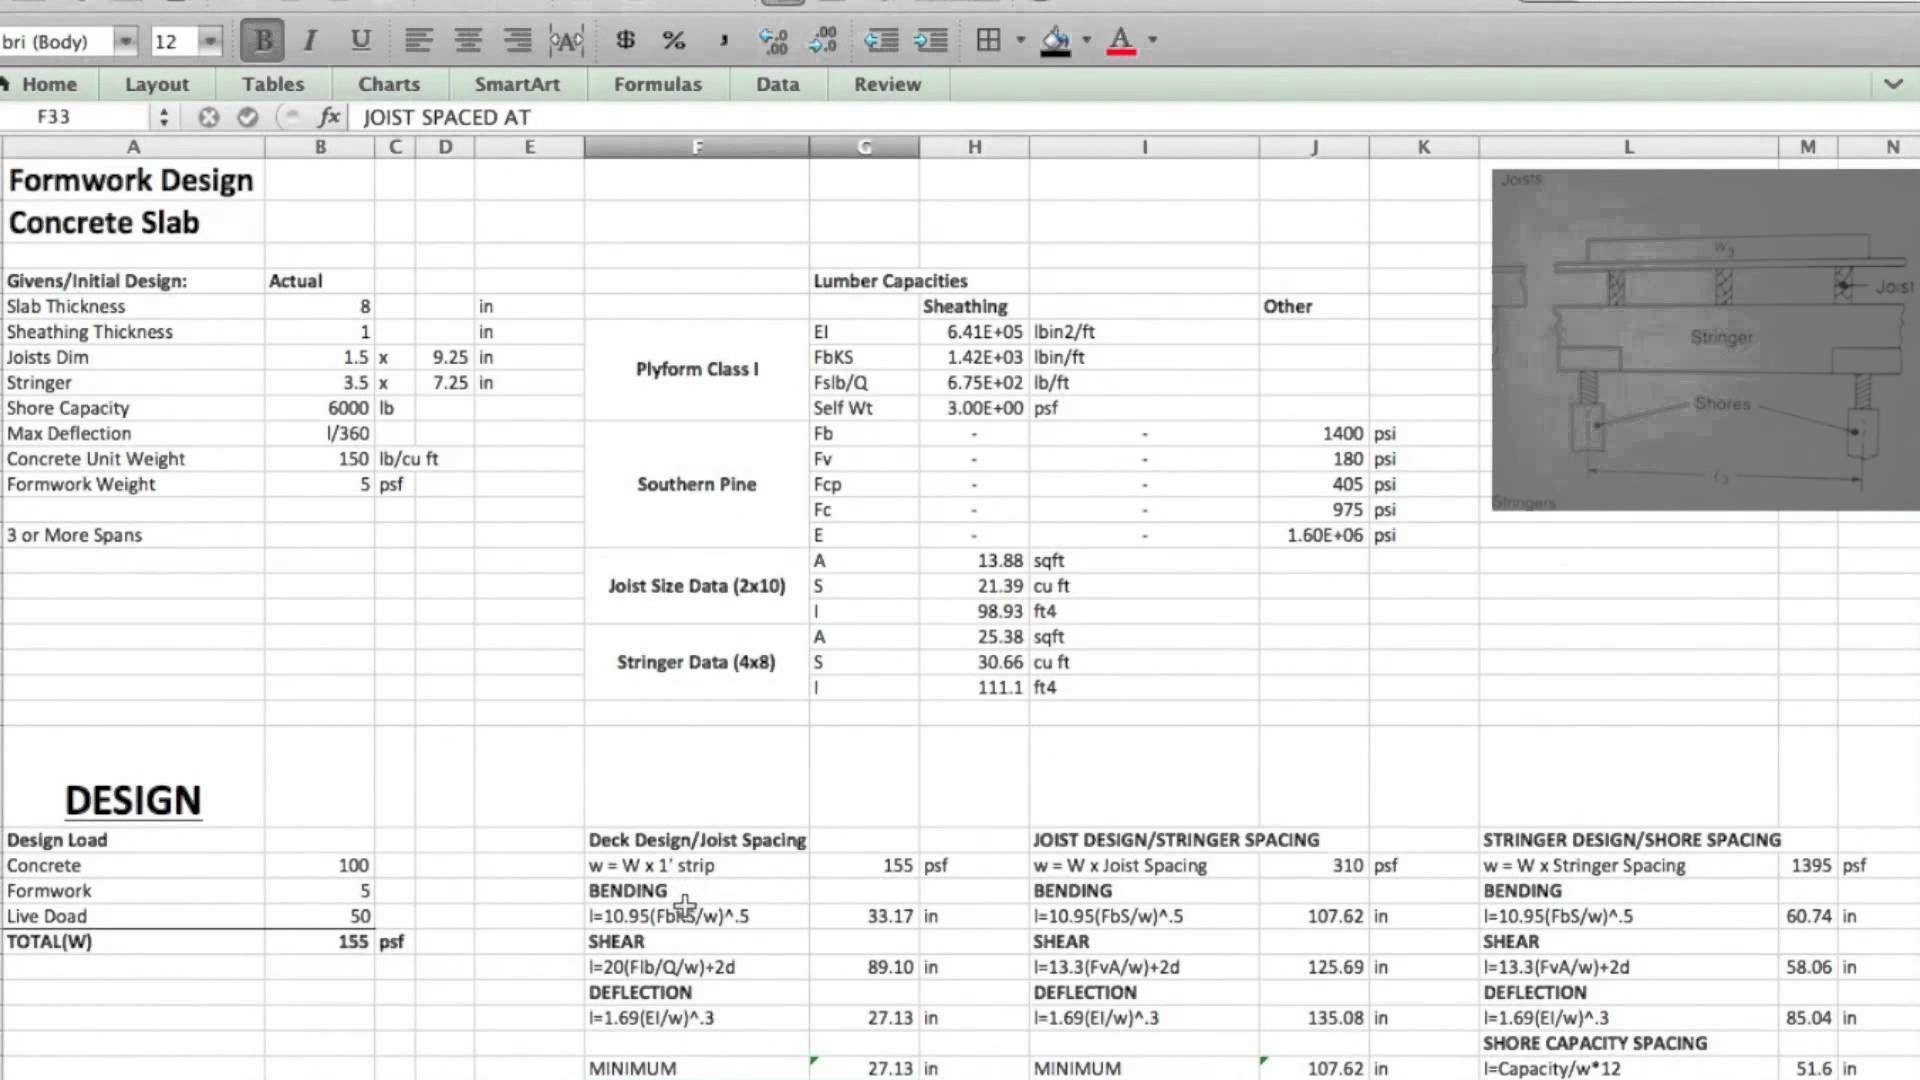 Formwork Design Spreadsheet In 2020 Spreadsheet Spreadsheet App Design